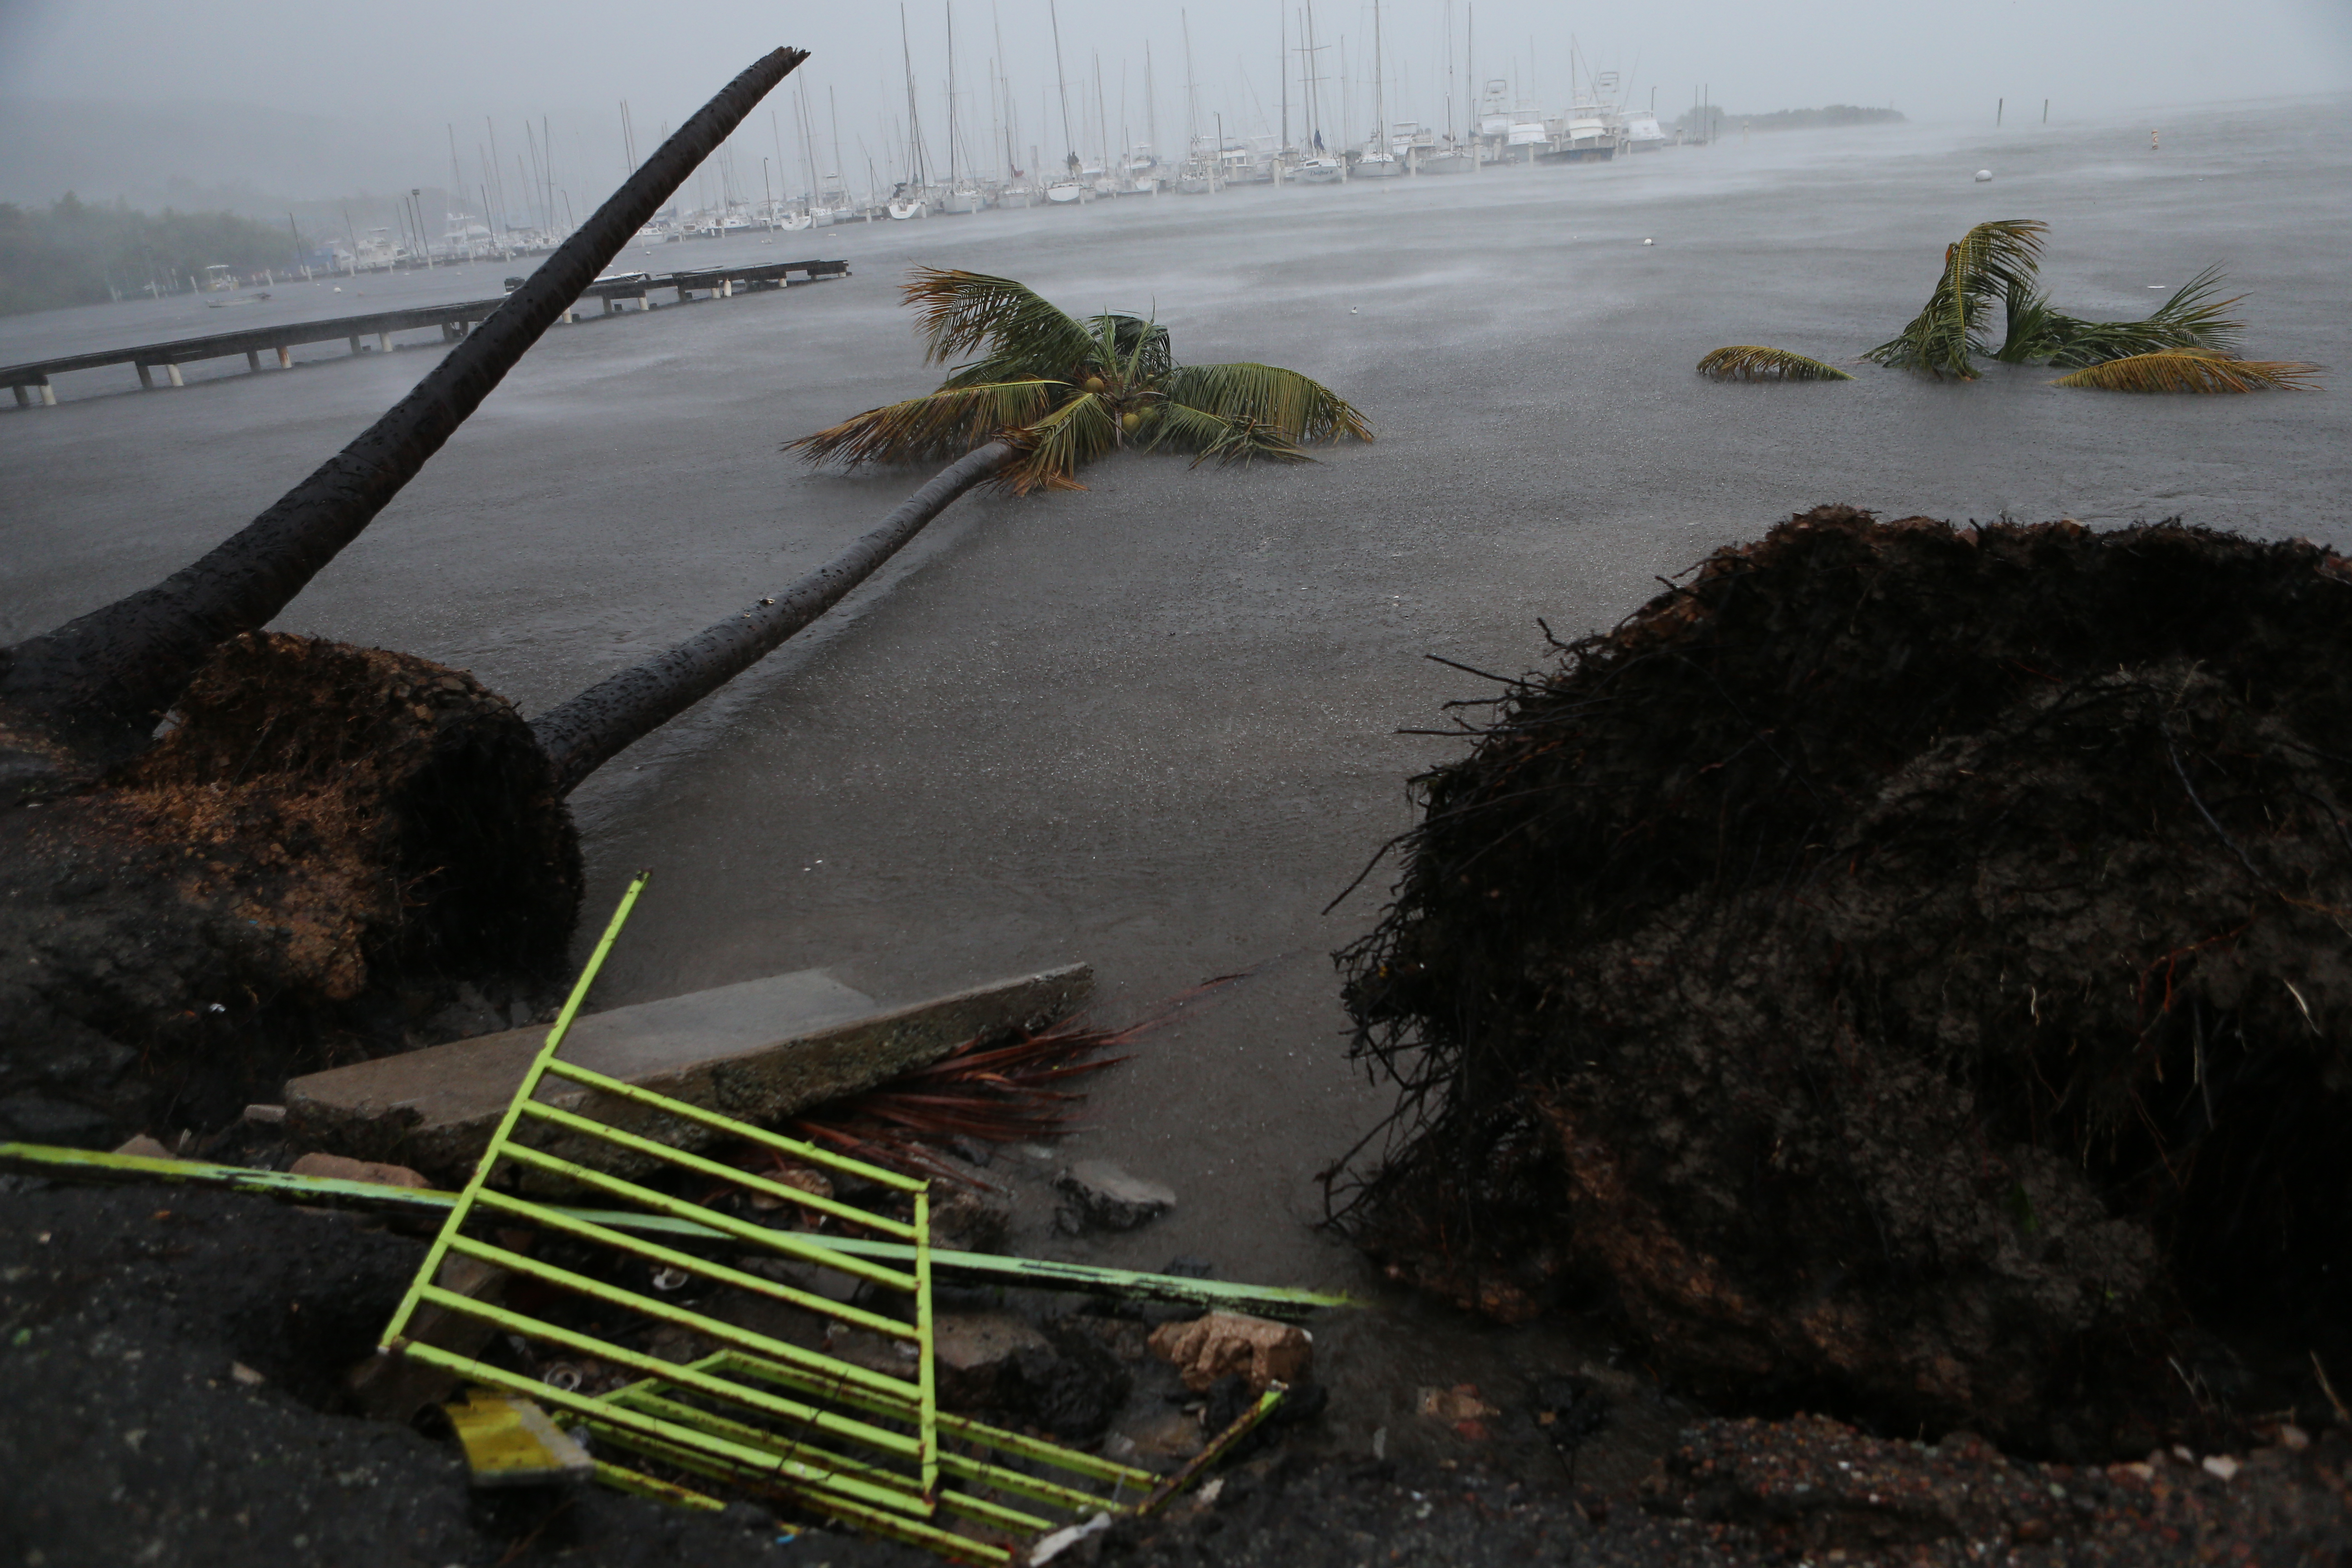 Debris is seen near the Puerto Chico Harbor during the passing of Hurricane Irma on September 6, 2017 in Fajardo, Puerto Rico.